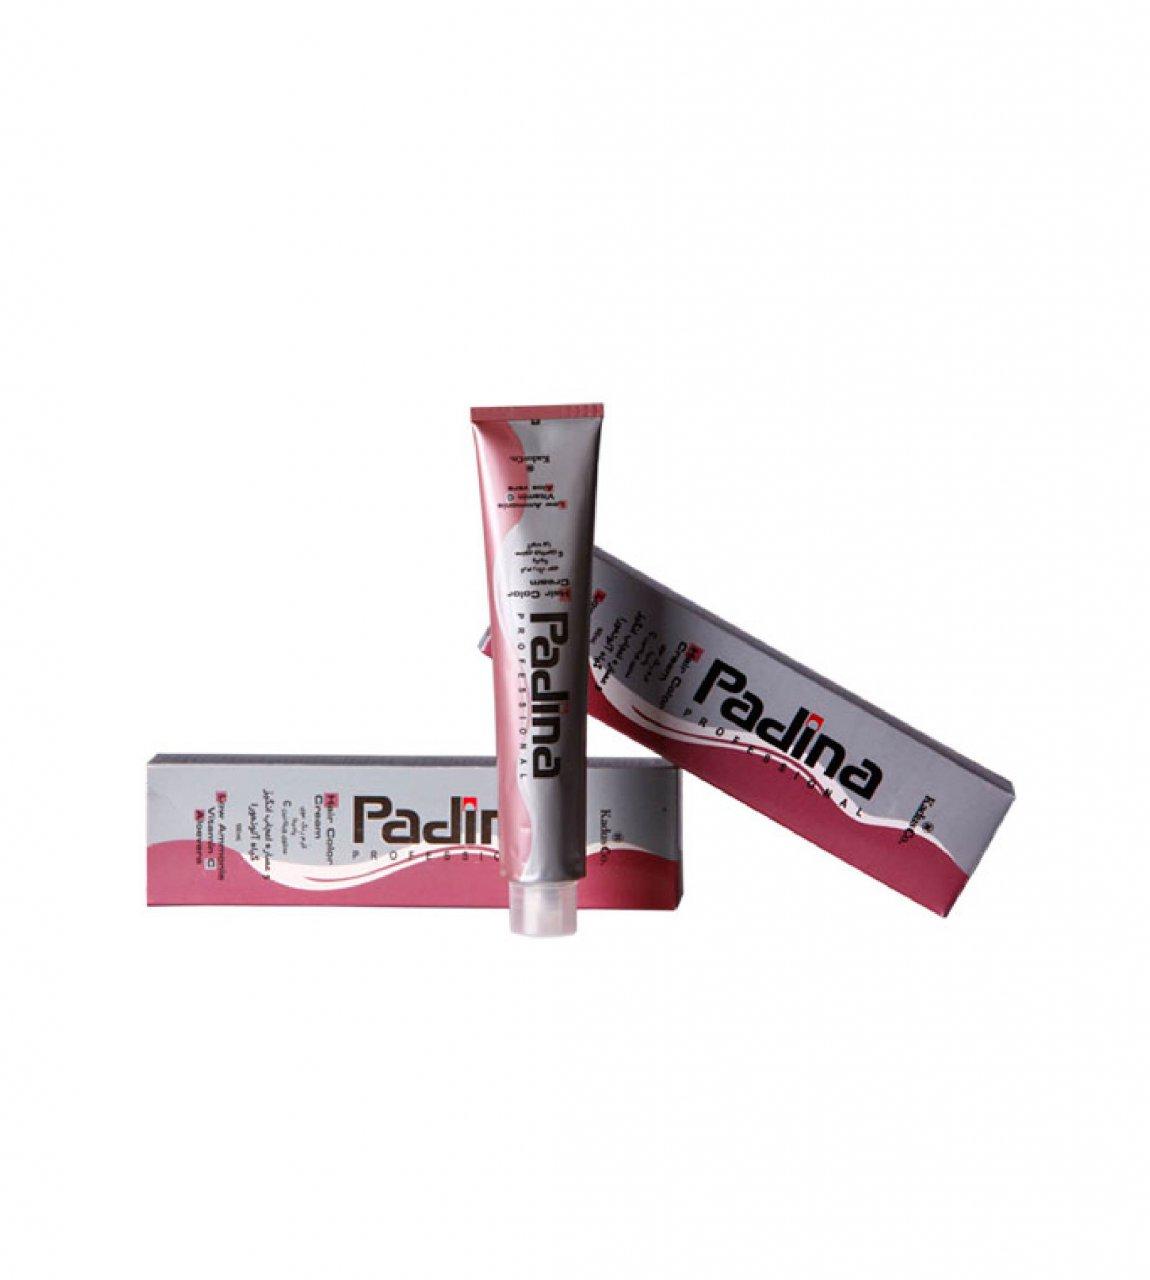 رنگ موی پادینا بلوند متوسط قوی کد 00_7